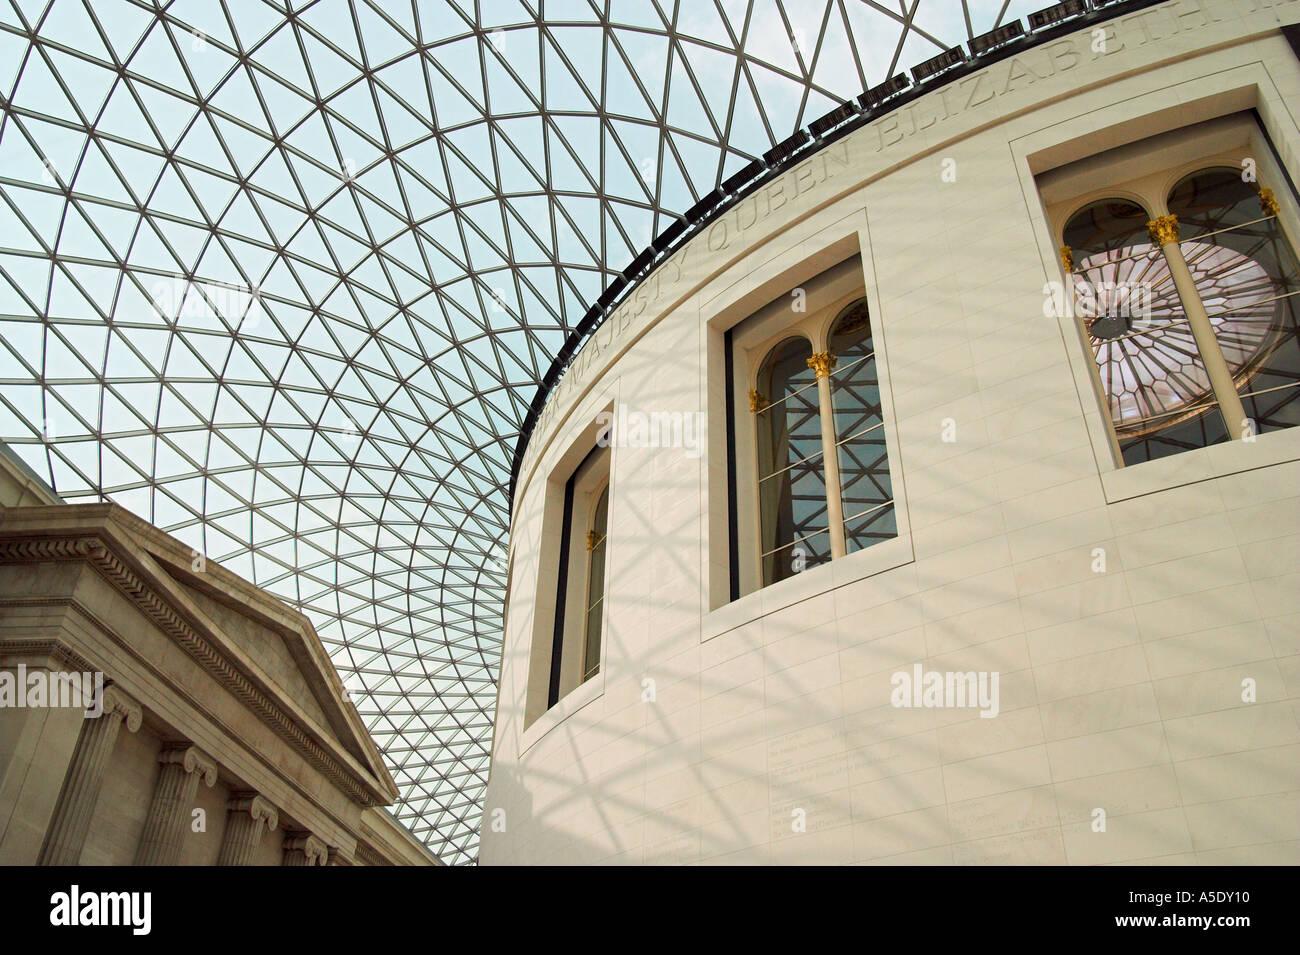 La Great Court al British Museum di Londra Inghilterra Immagini Stock